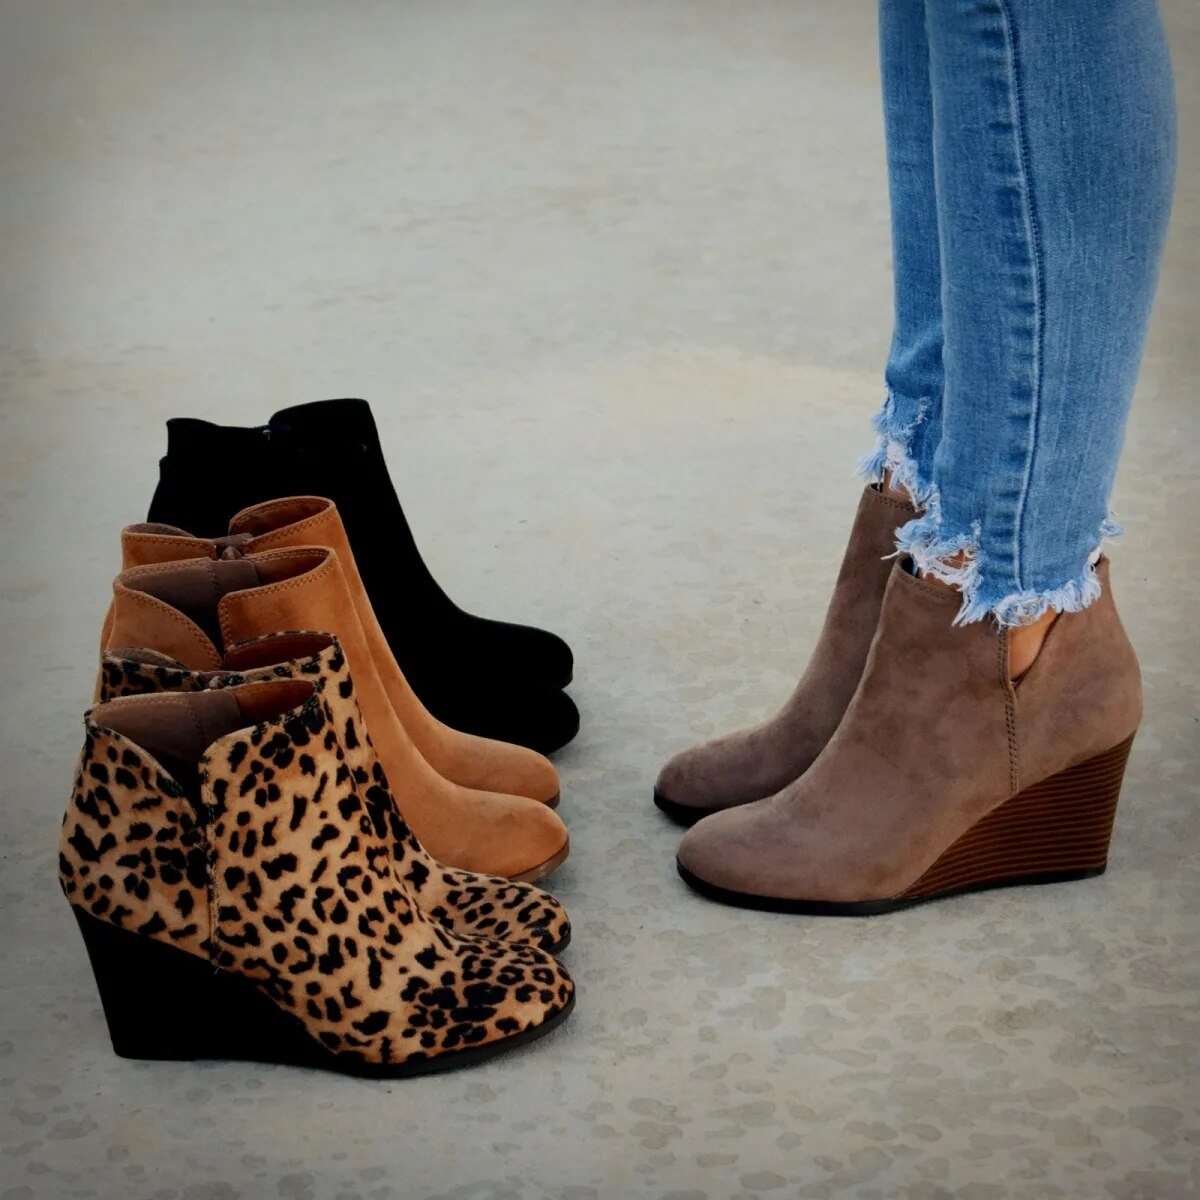 Fashion Short Boots Winter Women Leopard Ankle Boots Lace Up Footwear Platform High Heels Wedges Shoes Woman Bota Feminina